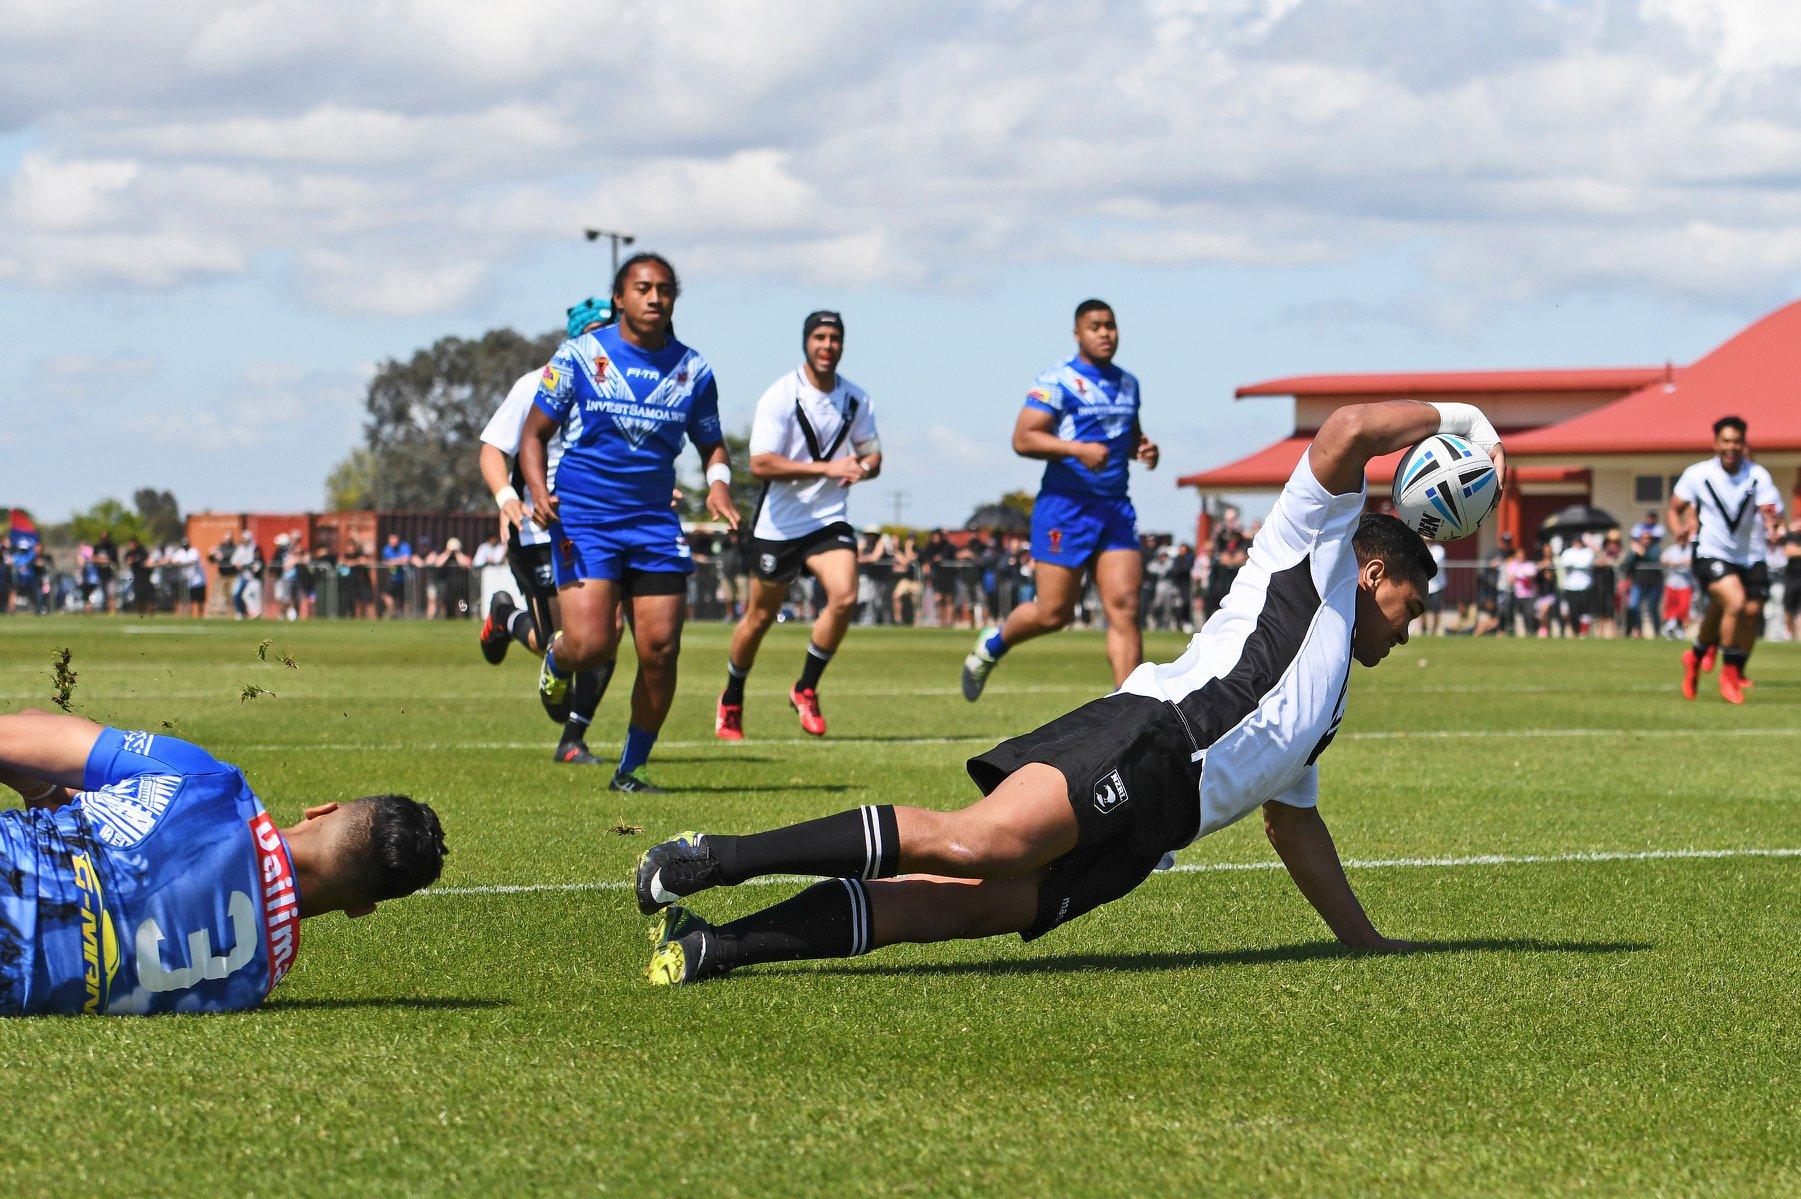 New Zealand Residents U18s defeated Toa Samoa U18s